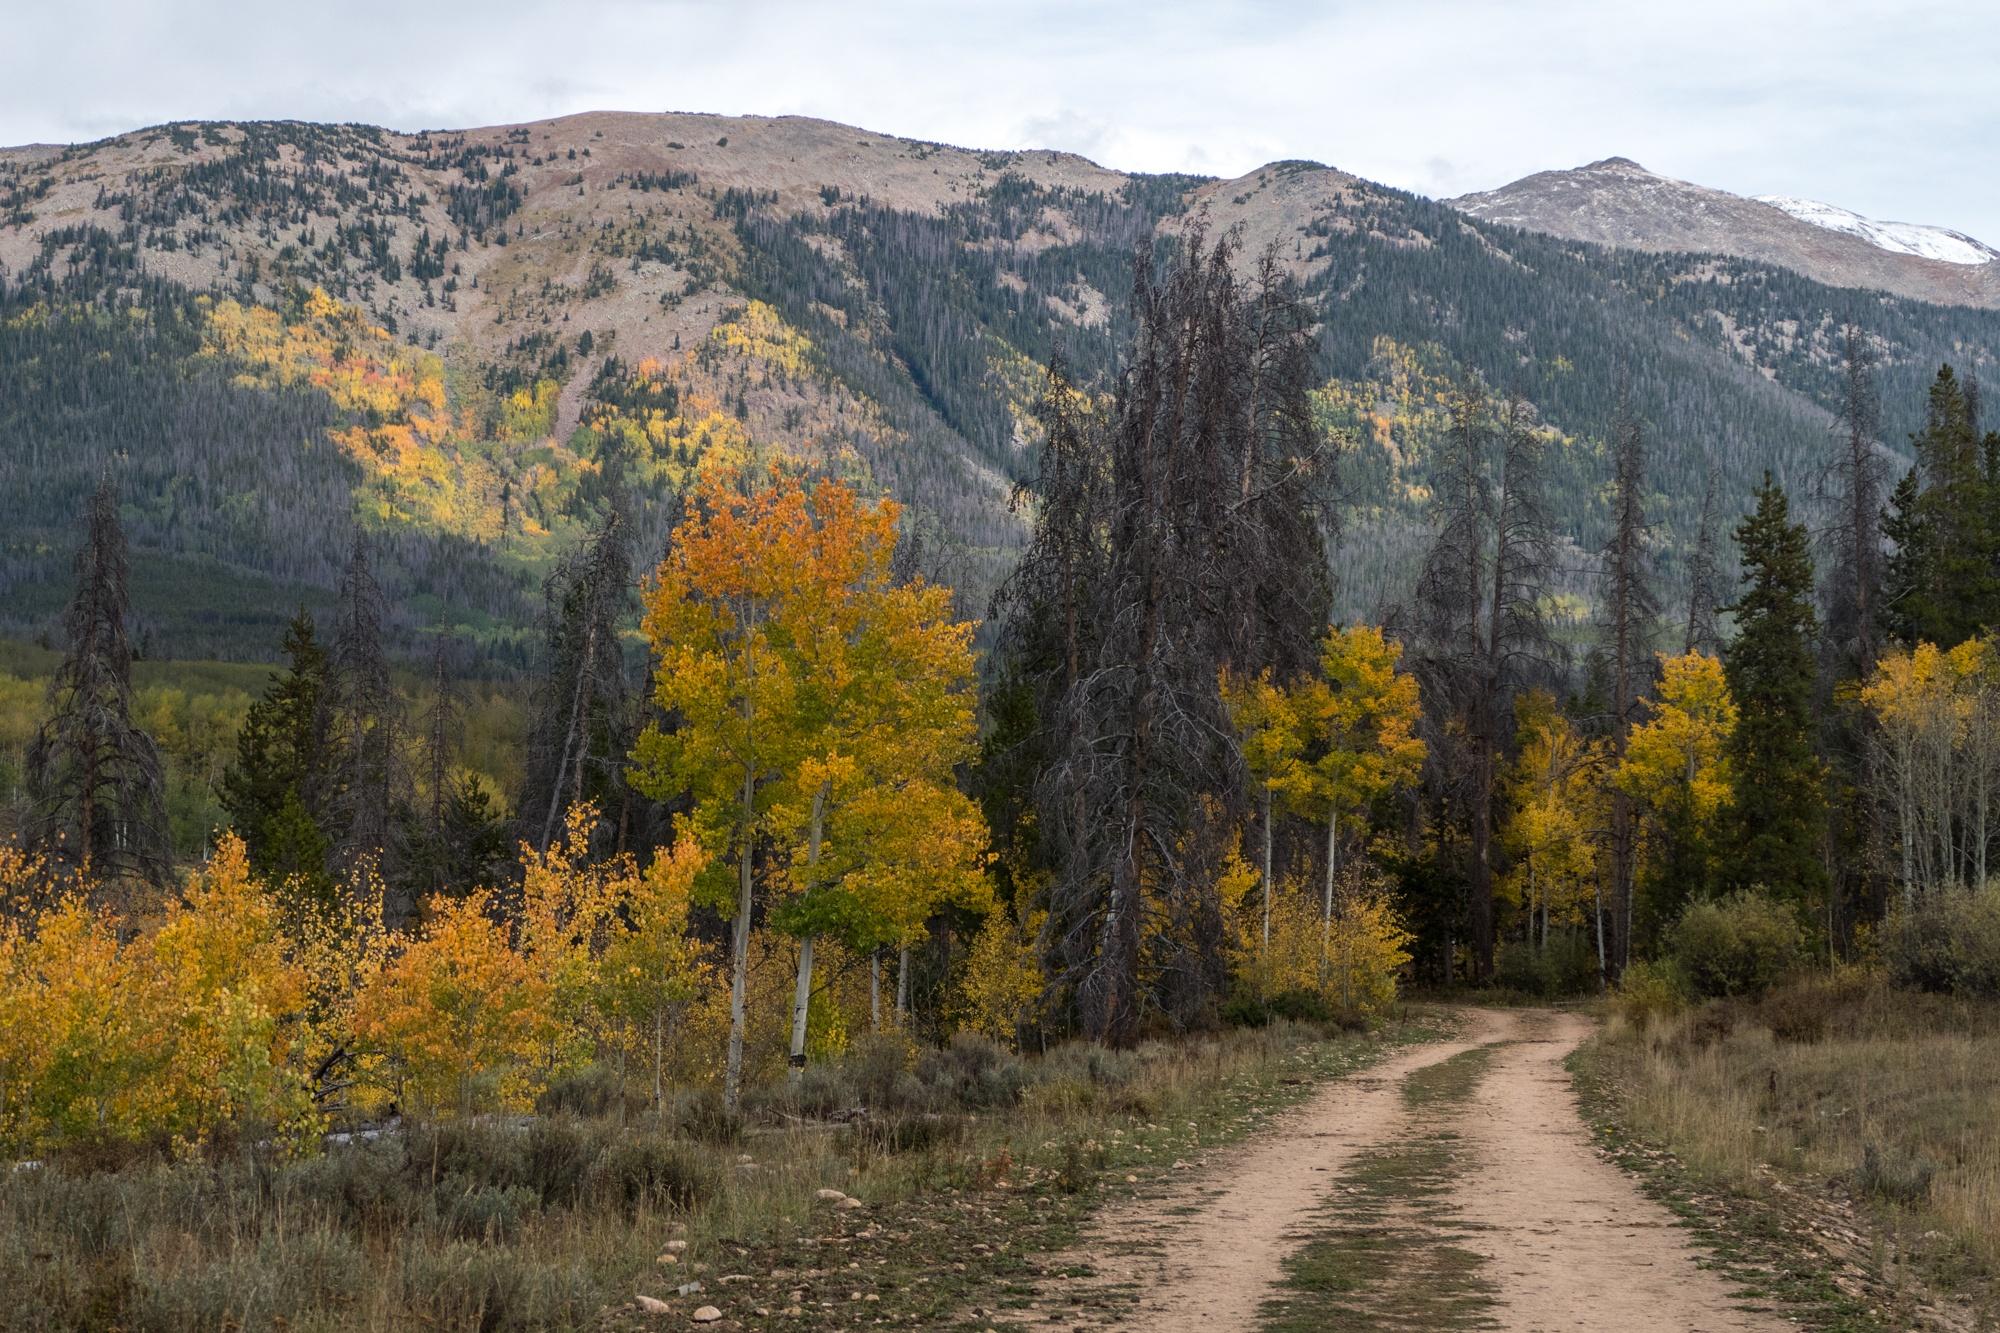 Fall foliage in northern Colorado